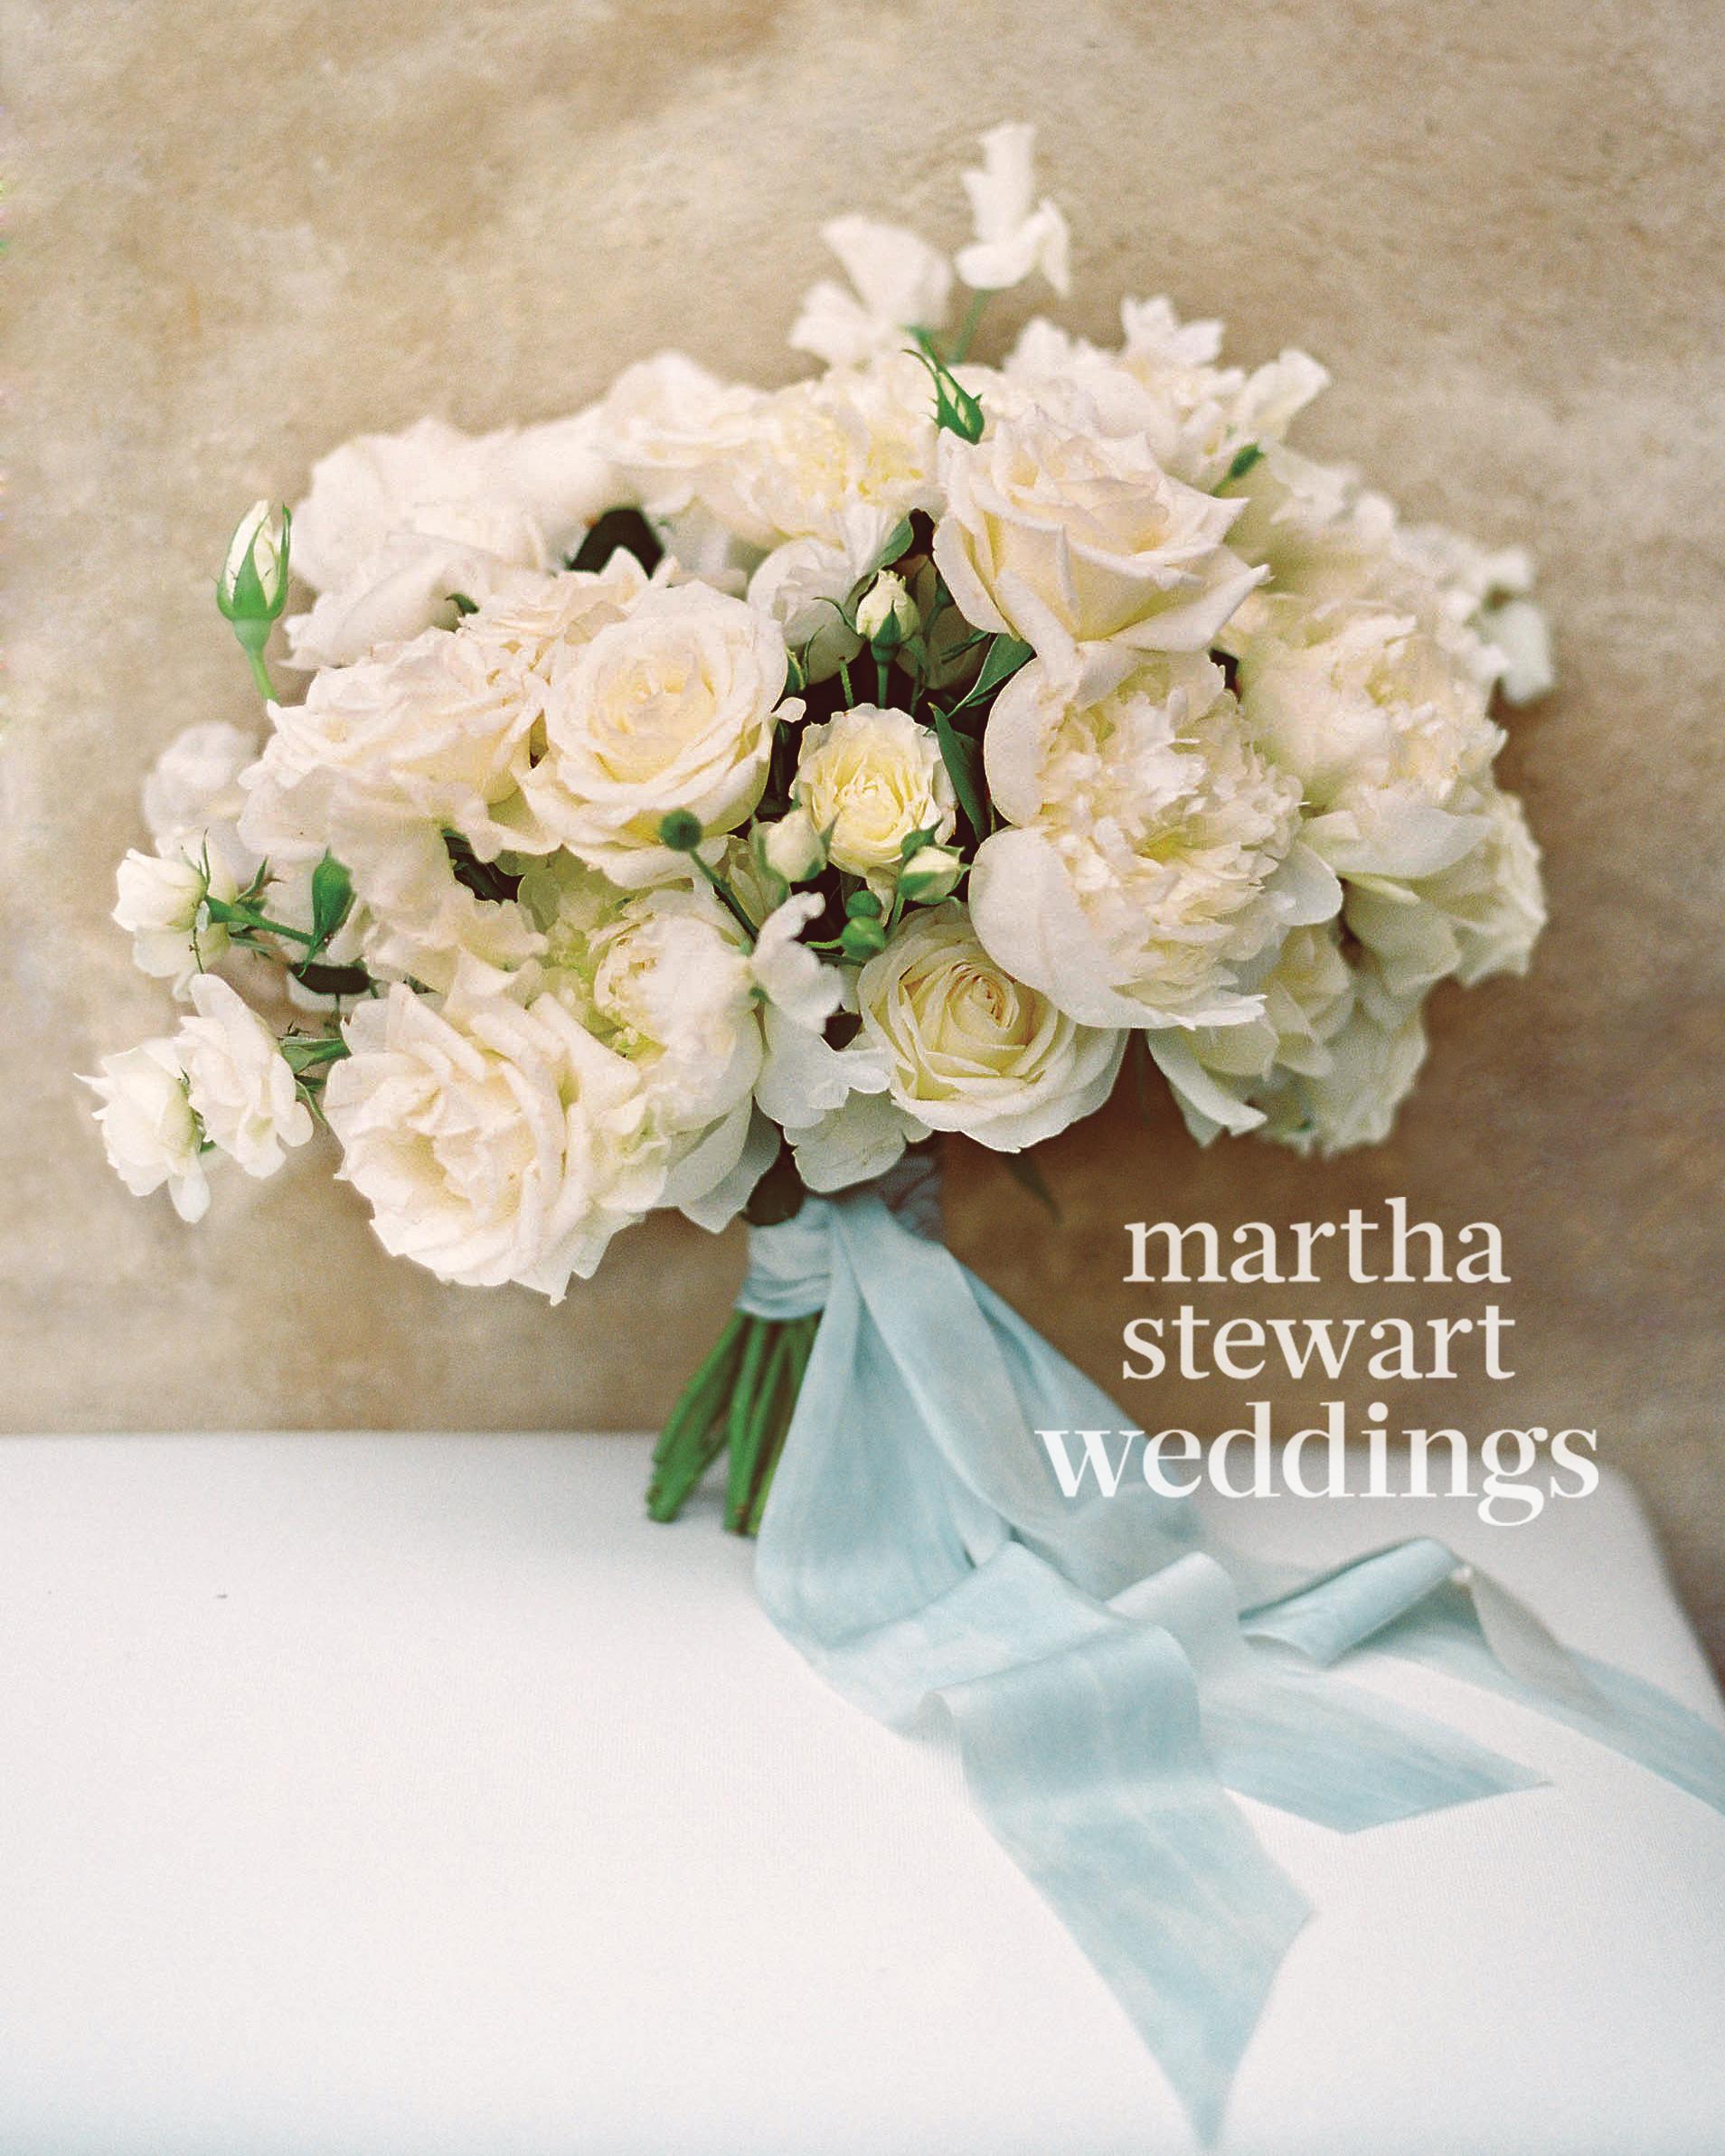 jenny-freddie-wedding-france-383-d112242-watermarked-1215.jpg